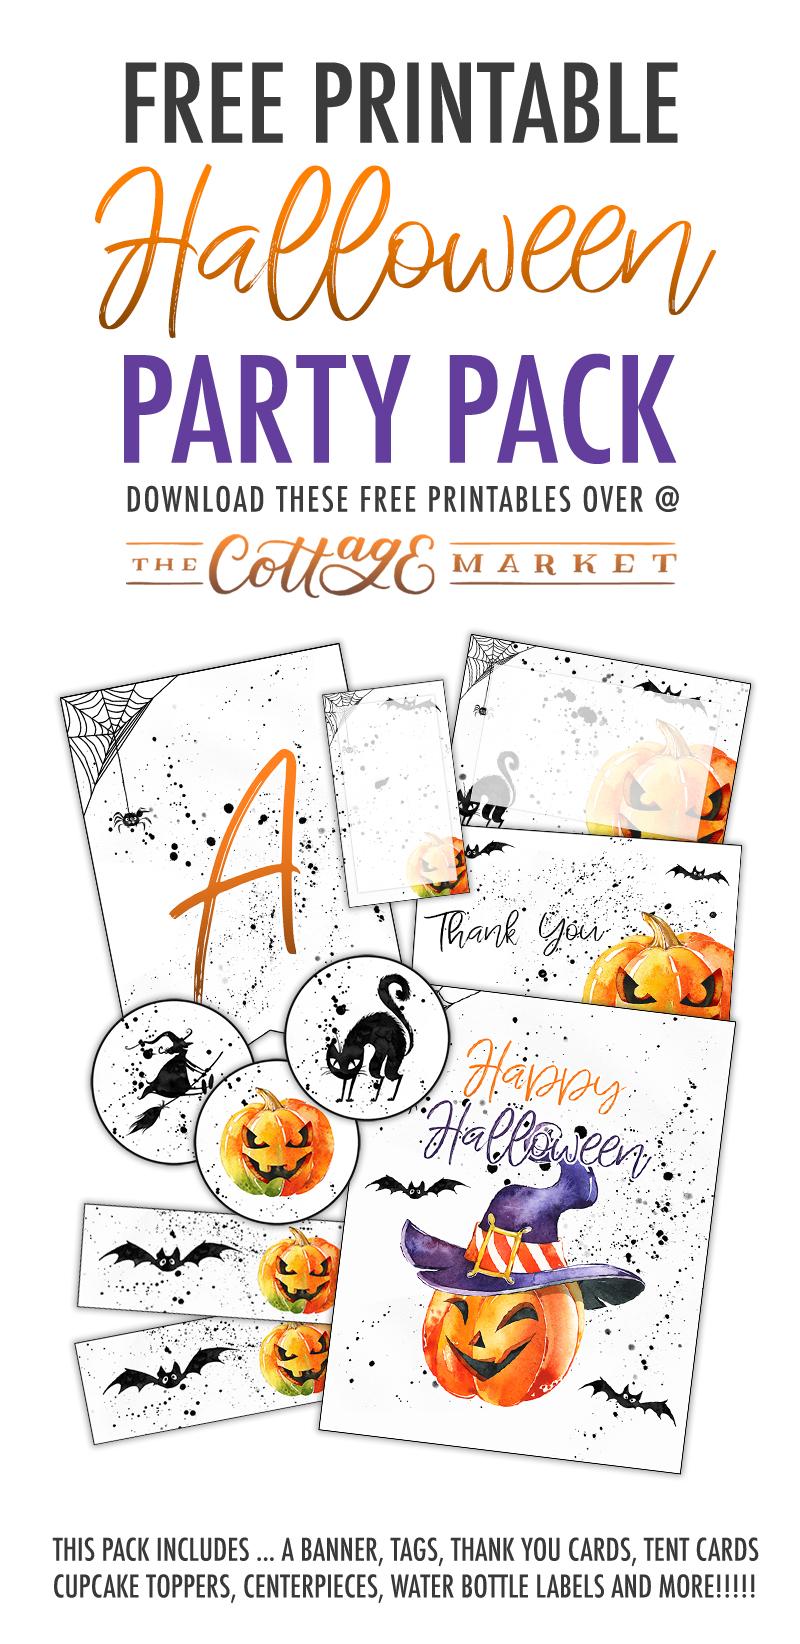 https://thecottagemarket.com/wp-content/uploads/2018/08/TCM-HalloweenPartyPack-T-1.jpg